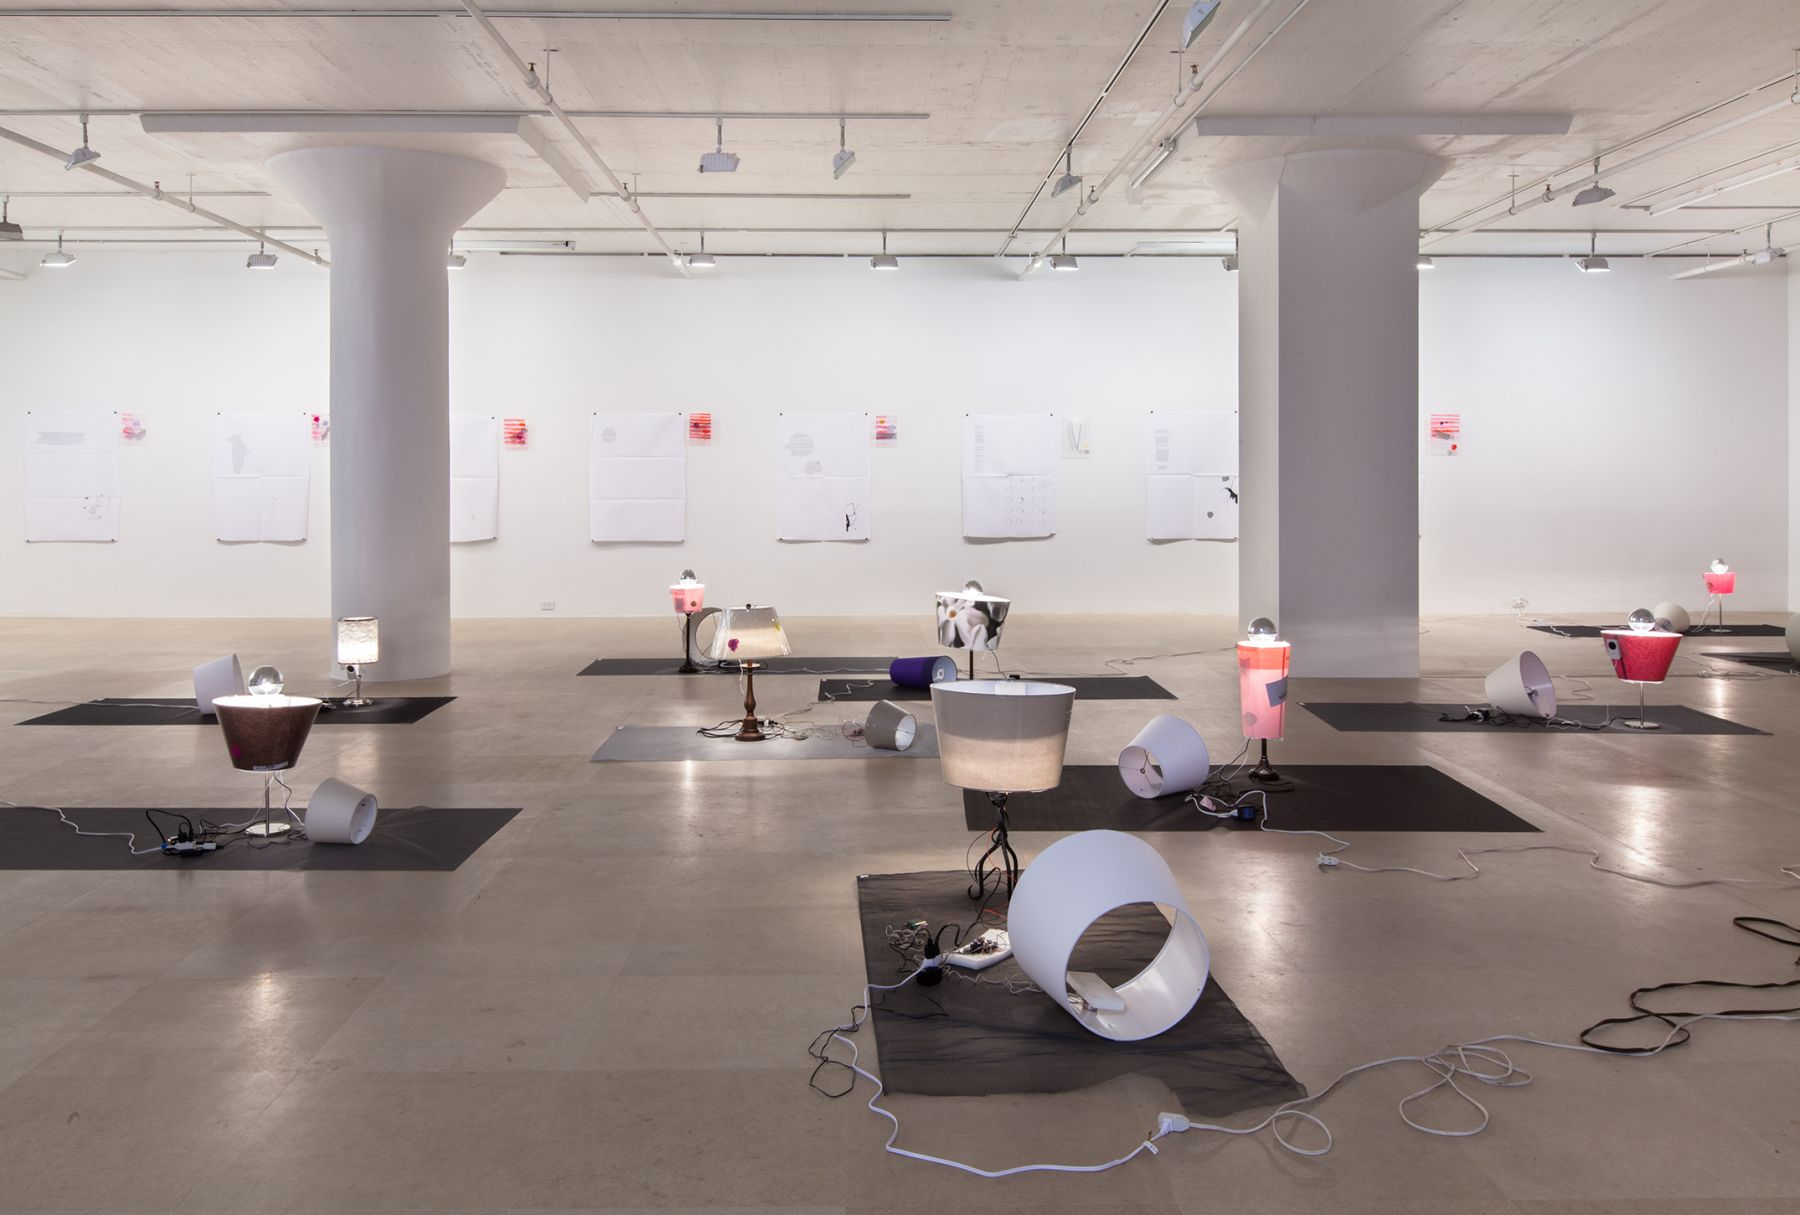 Josef Strau, Installation view, Exercises ab initio..., Greene Naftali, New York, 2012